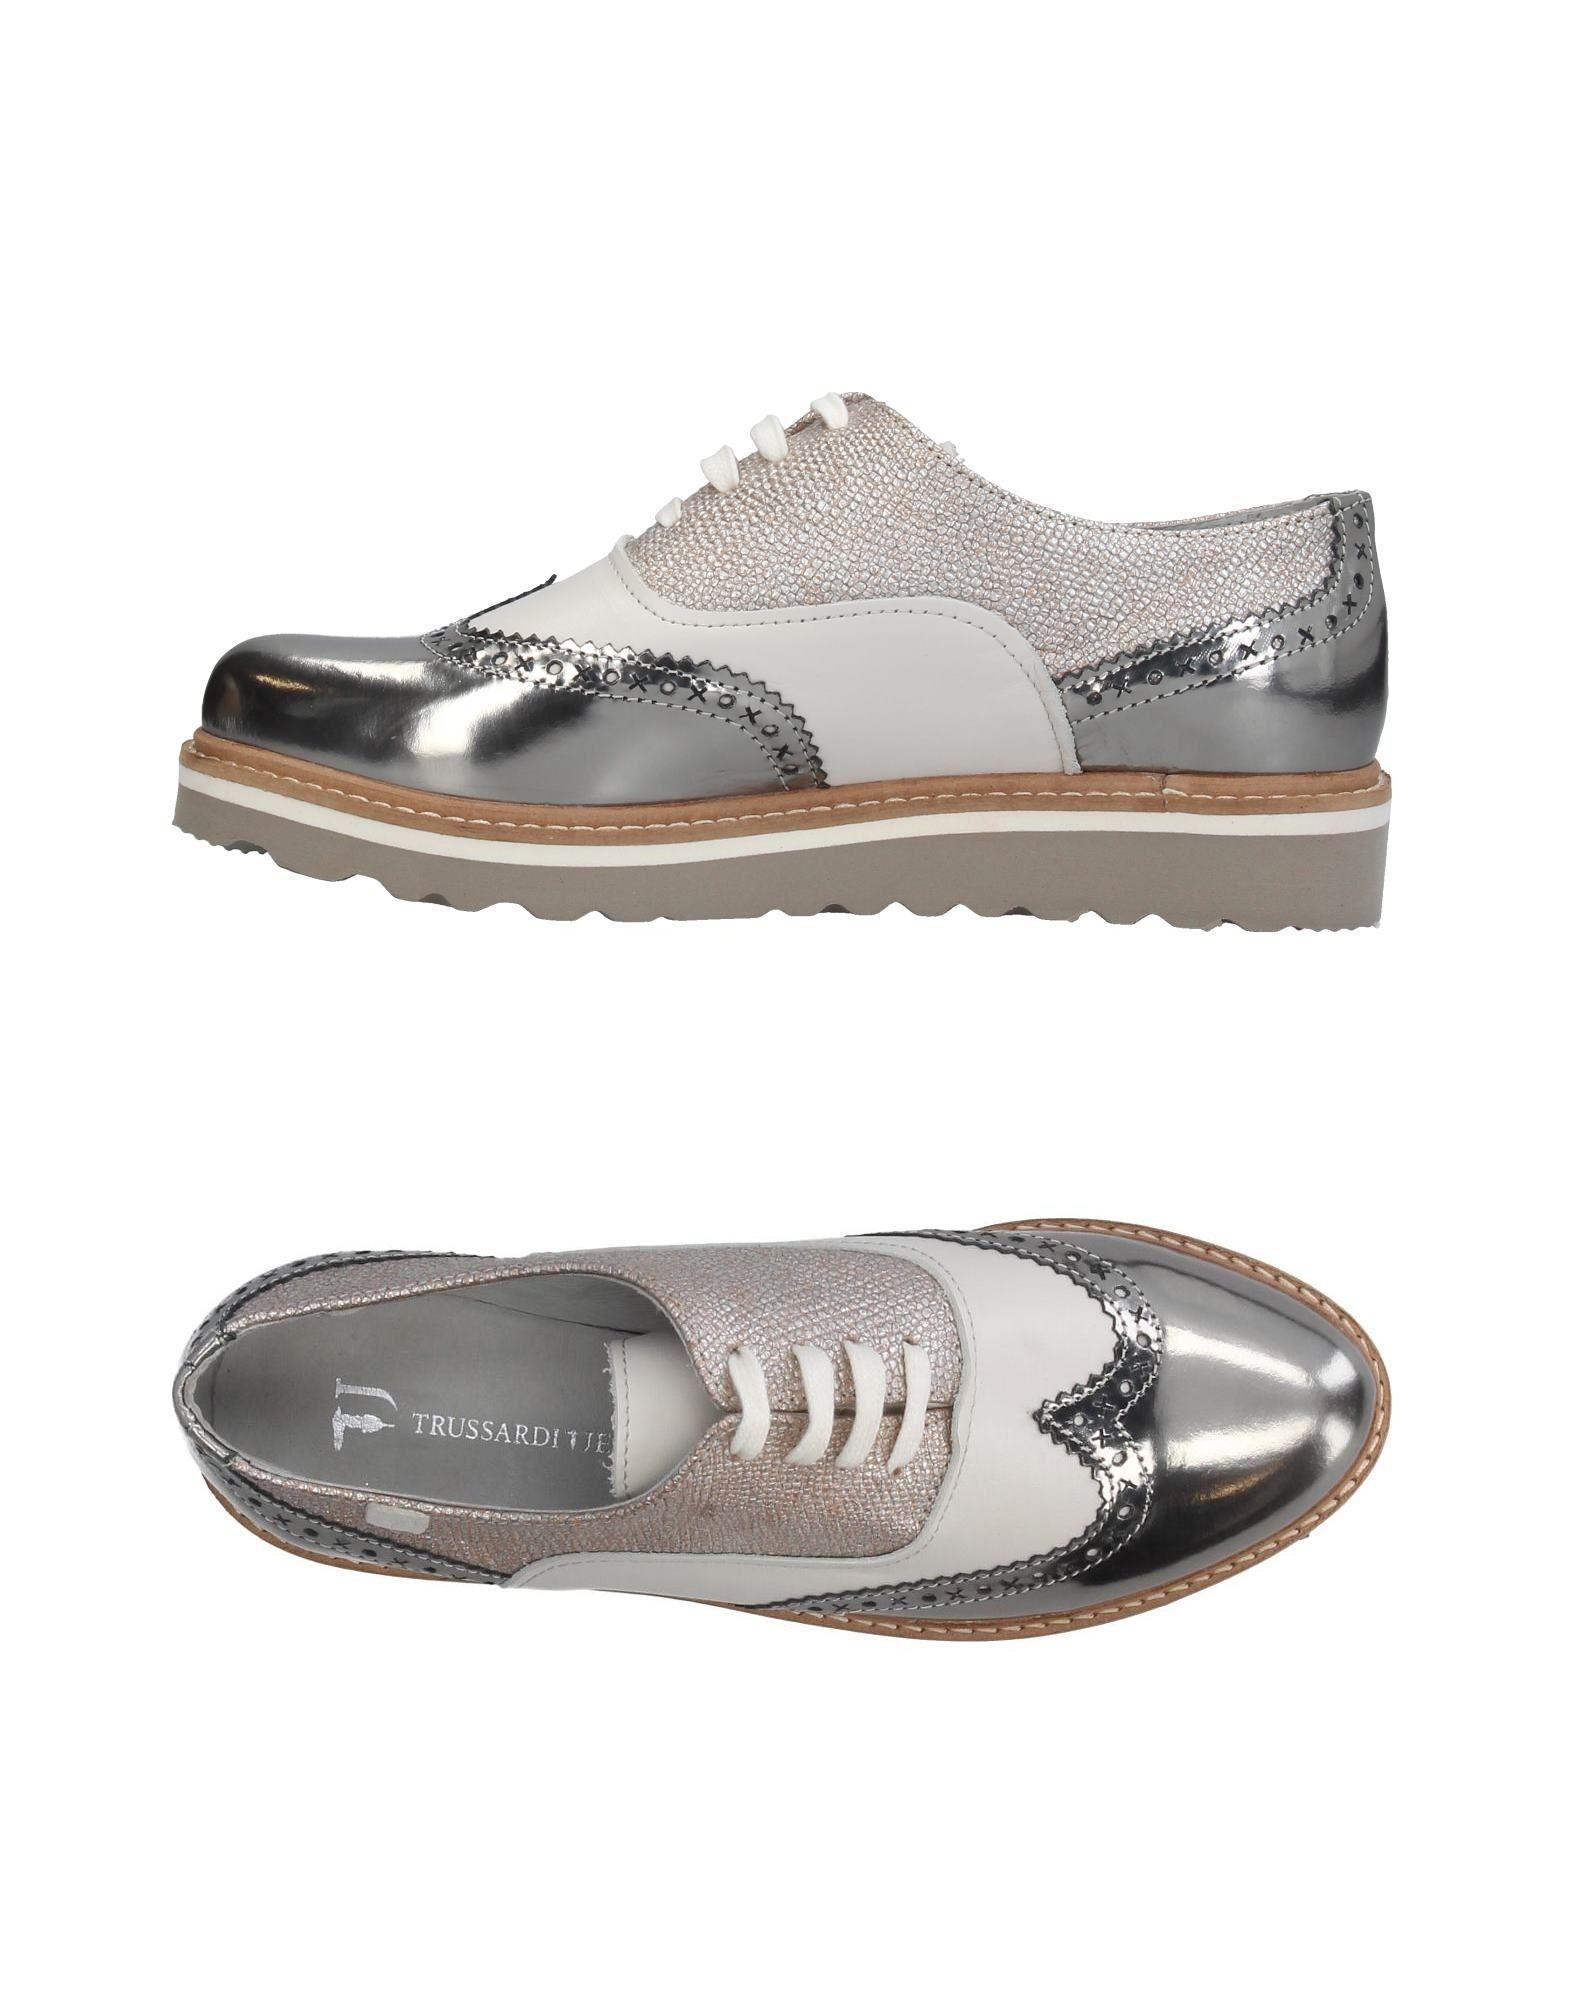 TRUSSARDI JEANS Обувь на шнурках trussardi jeans обувь на шнурках